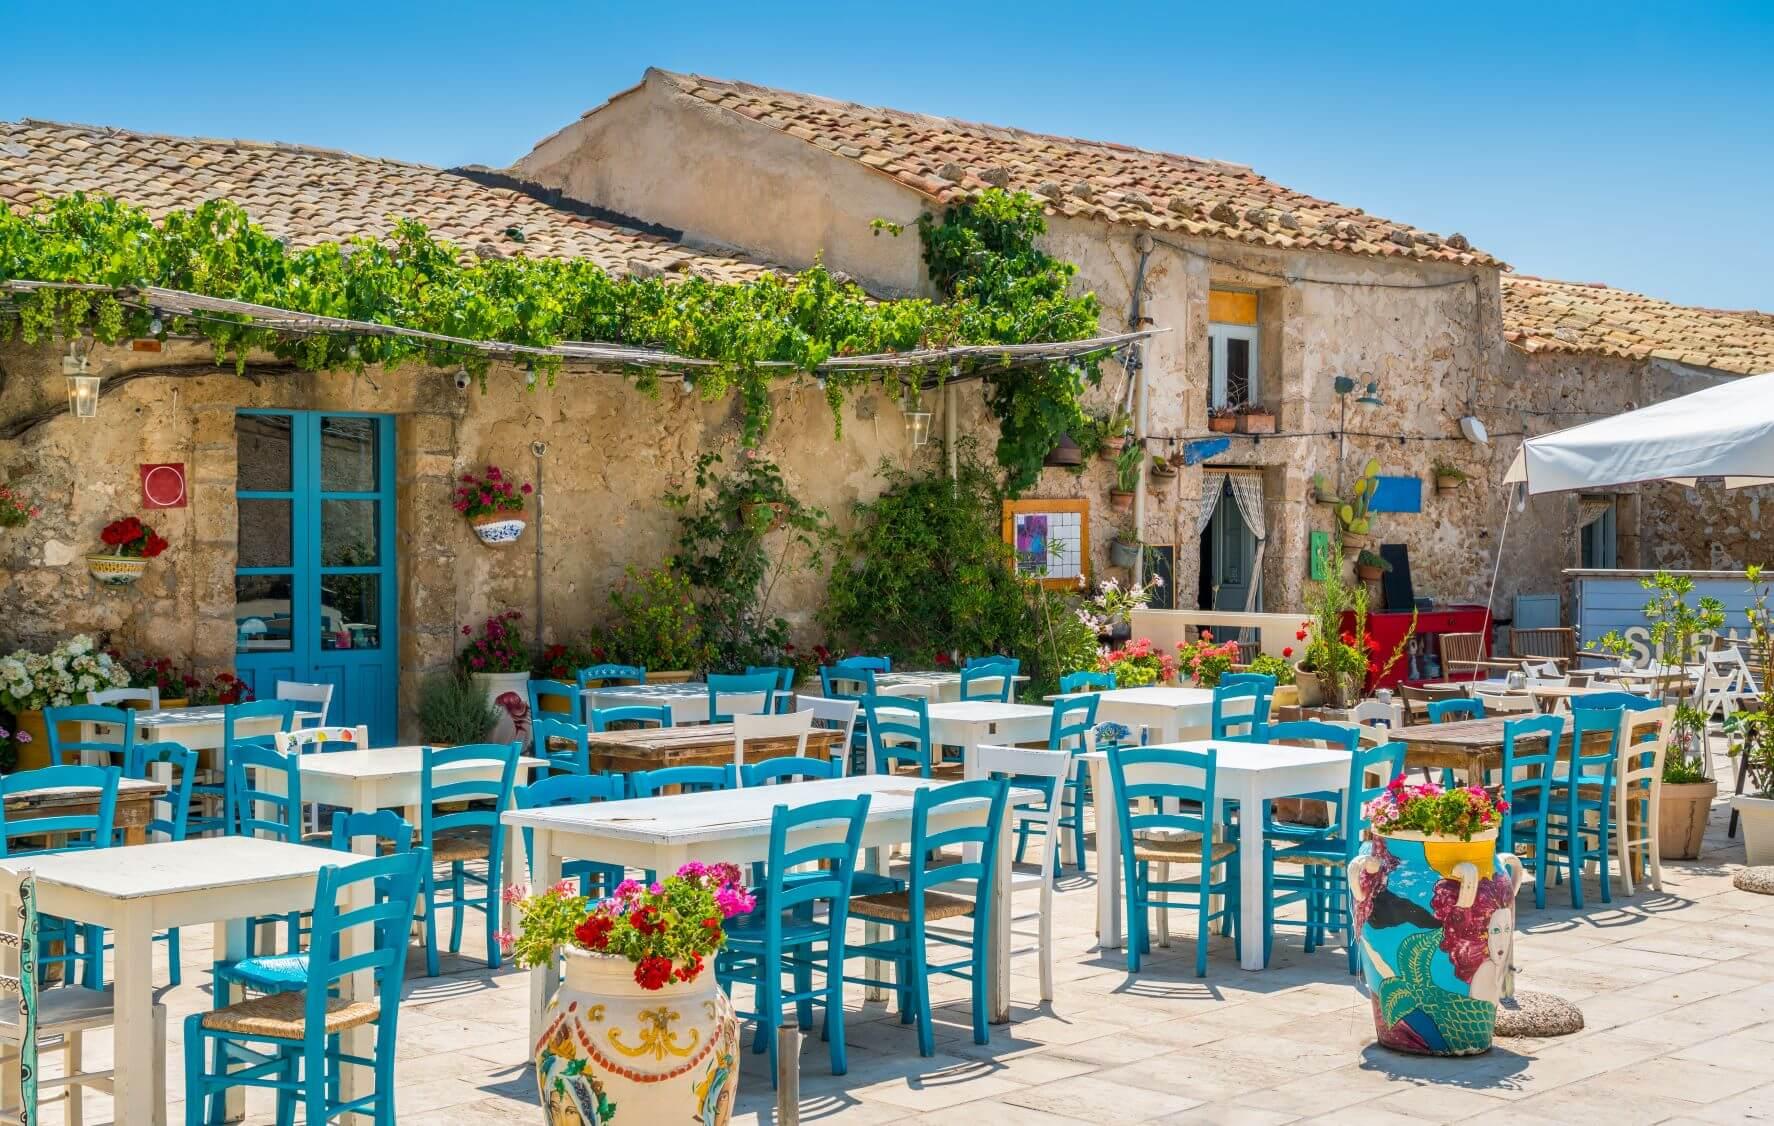 restaurant in Sicily